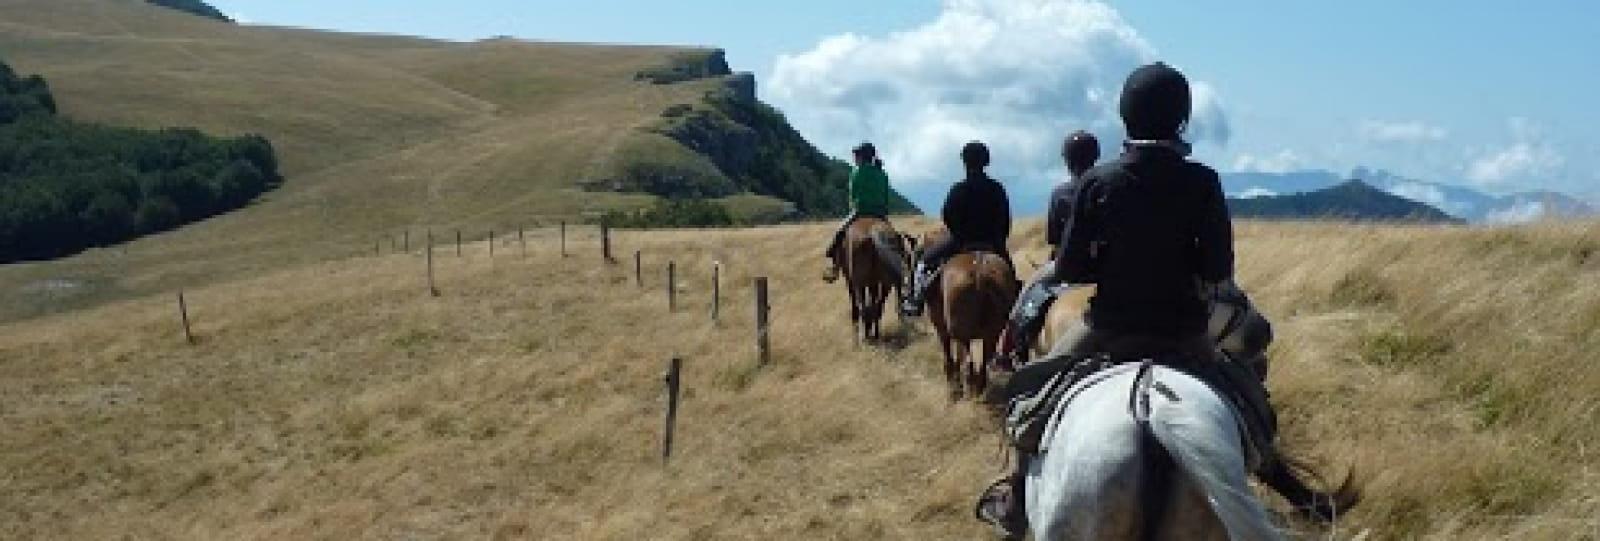 Equitation avec Equisens